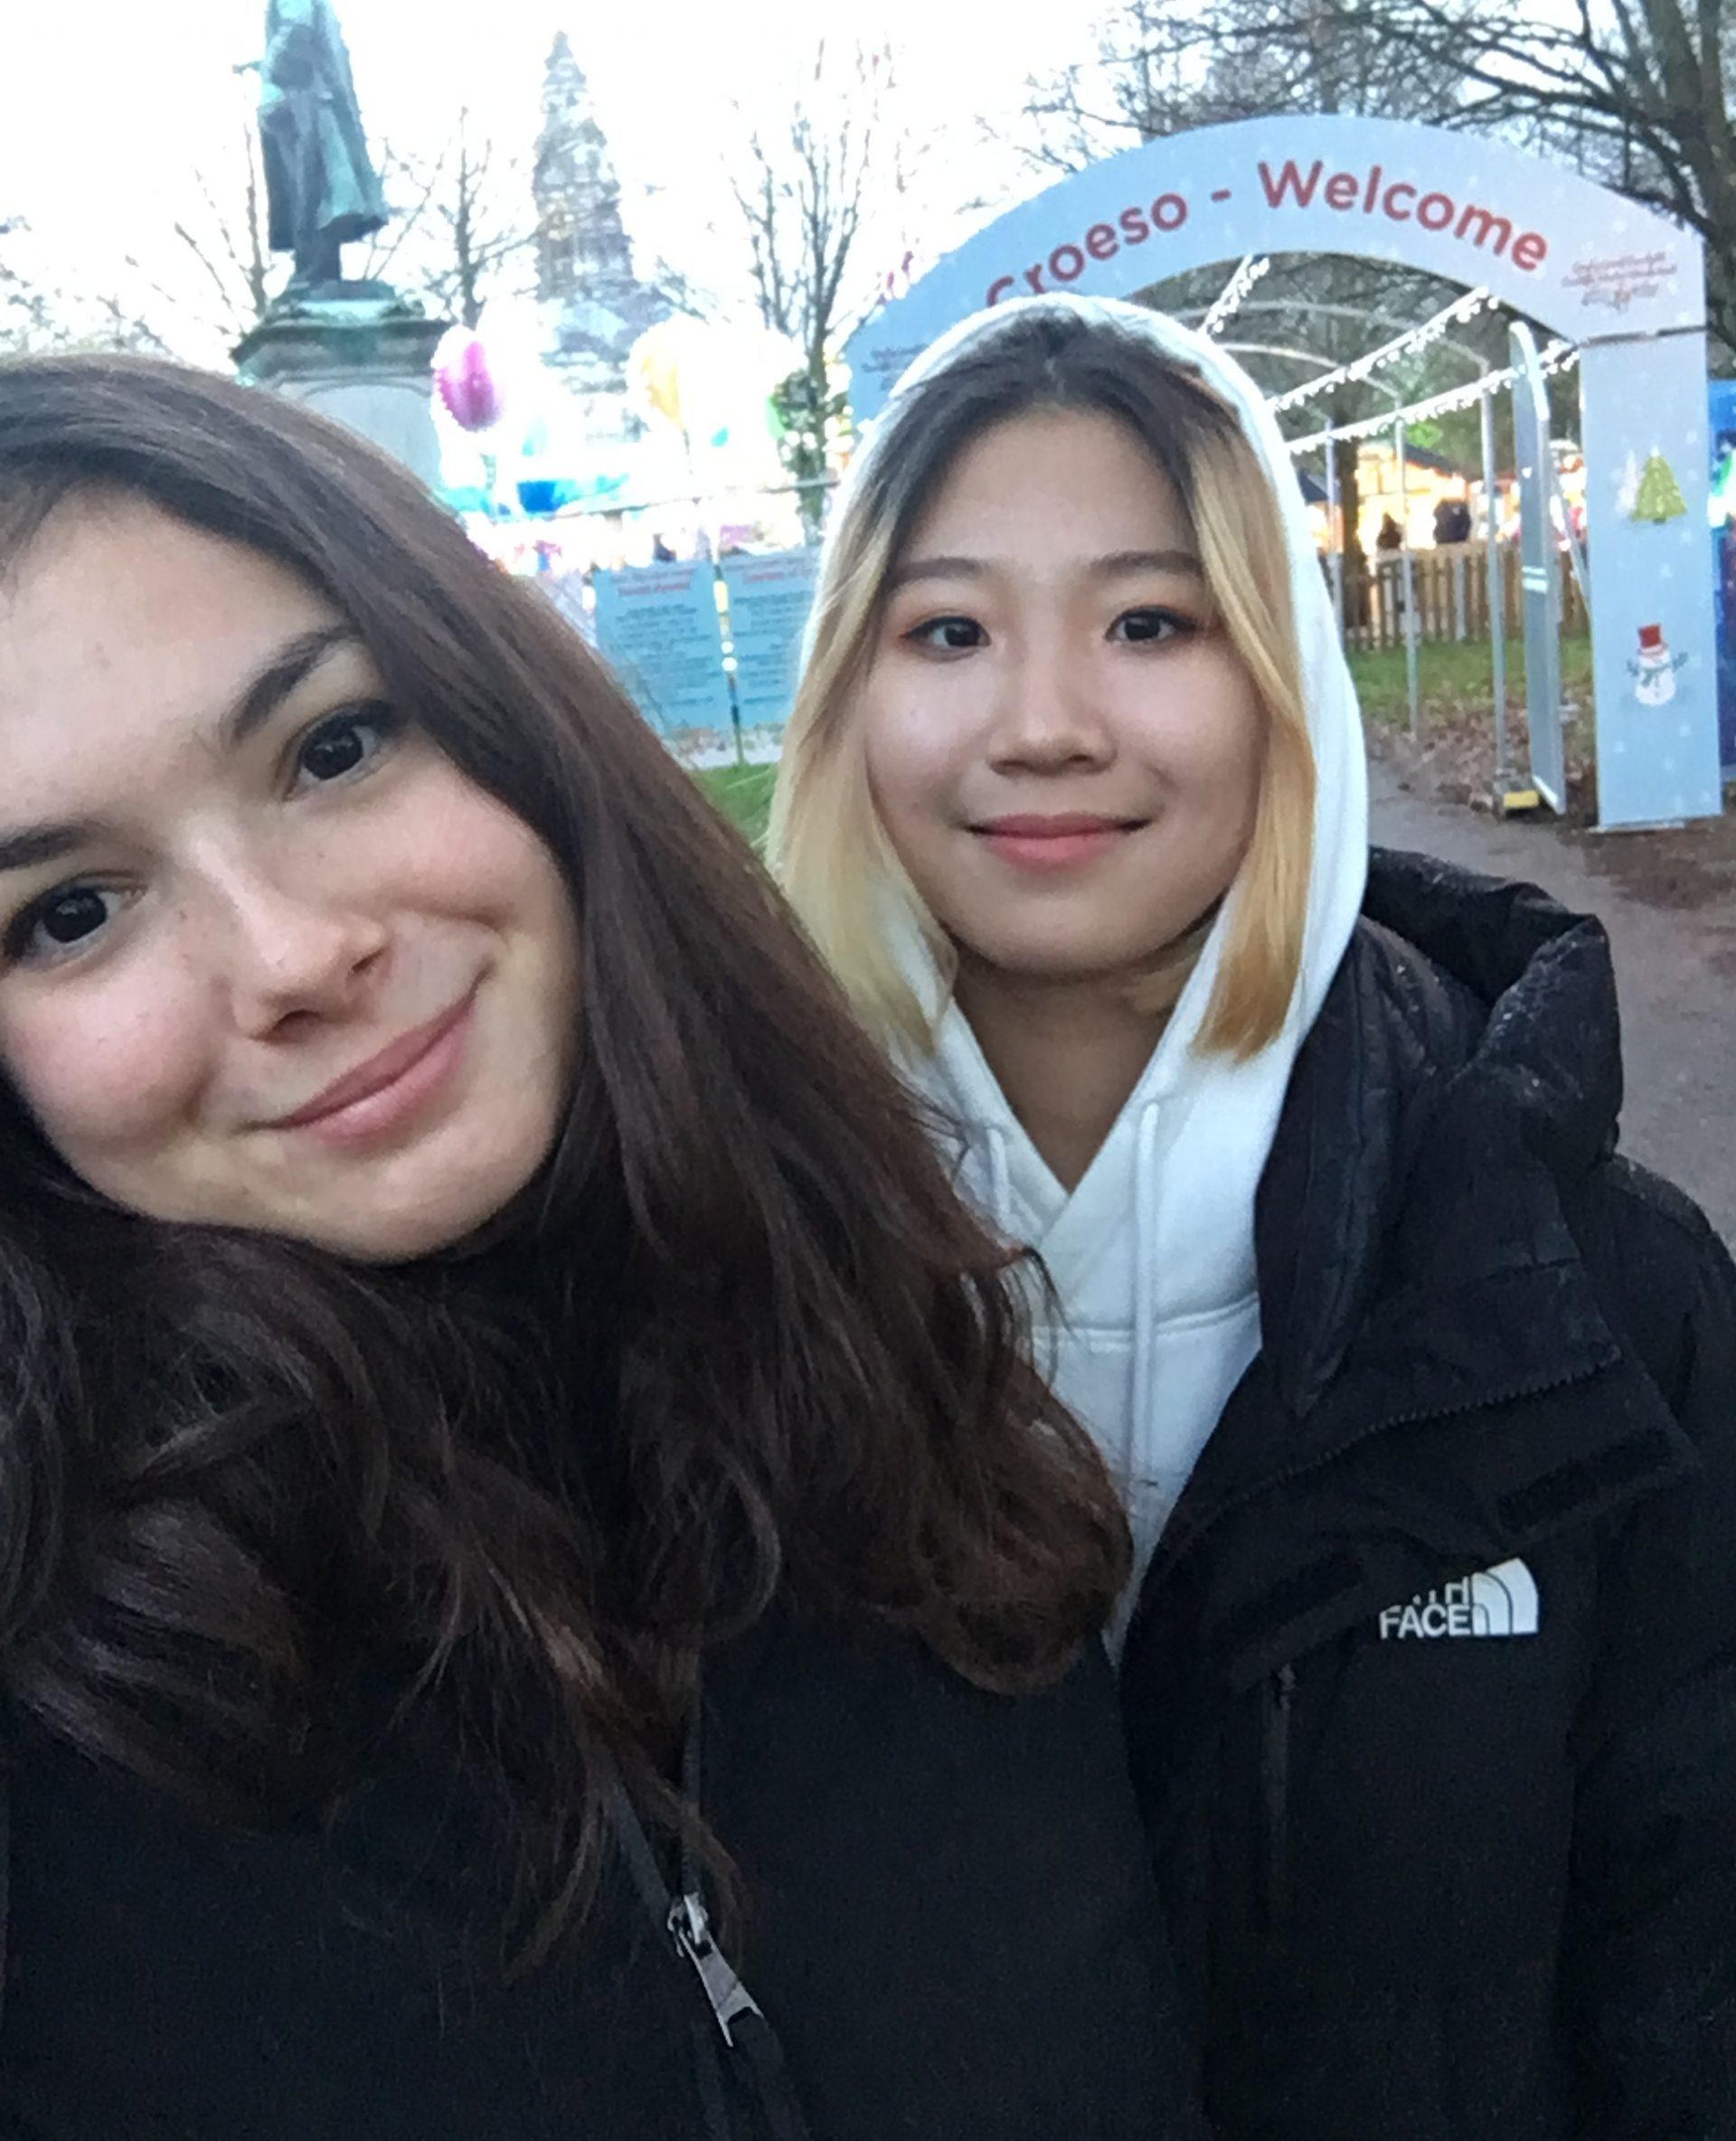 Laura and her friend at Winter Wonderland